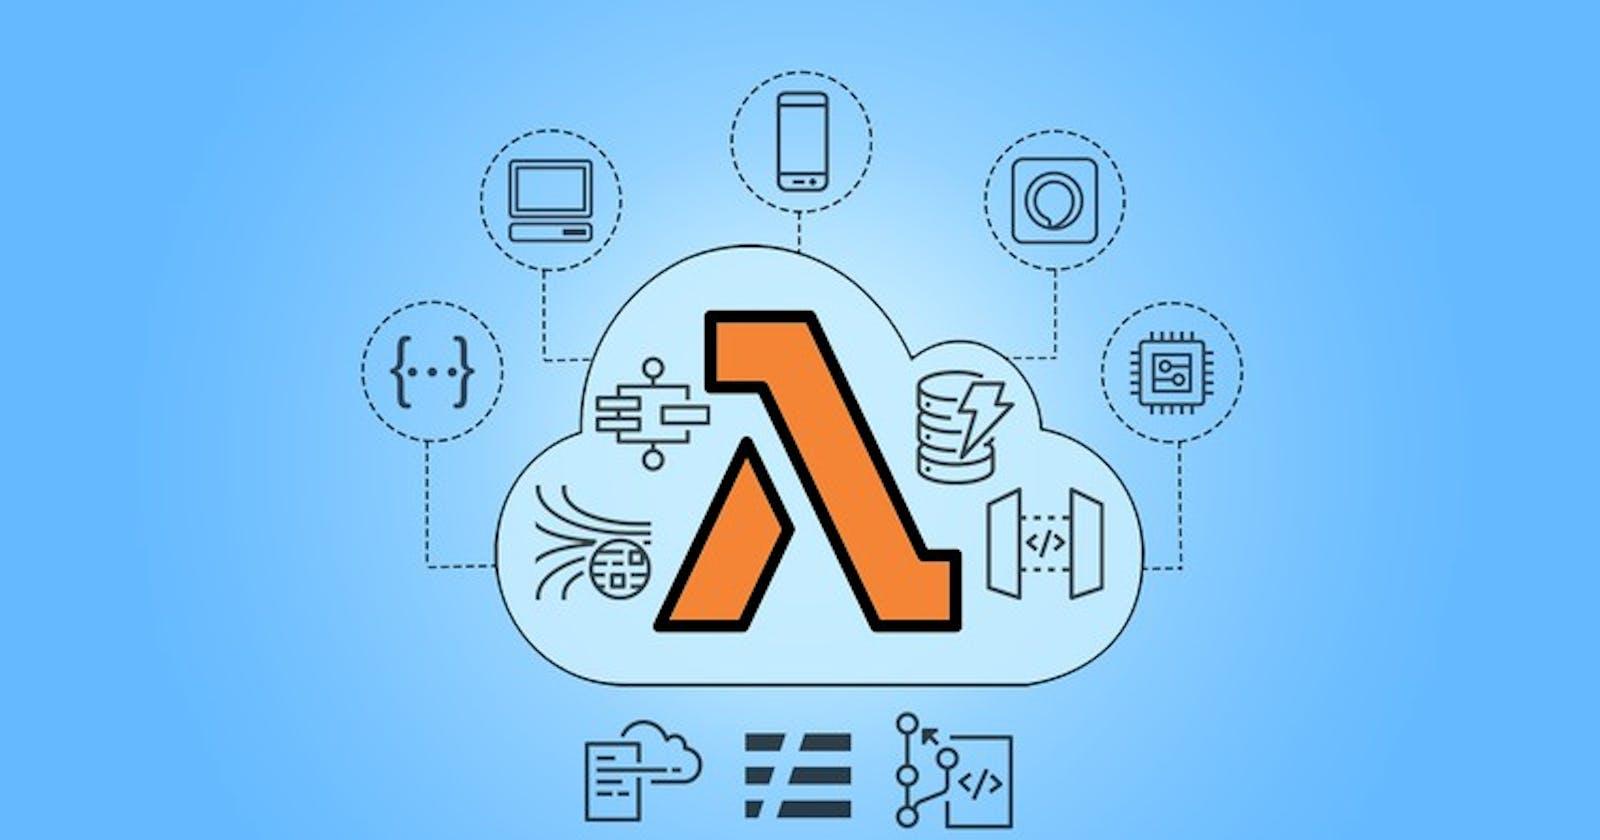 Try Node.js 15.2.0 on AWS Lambda by using AWS Custom Lambda Runtime